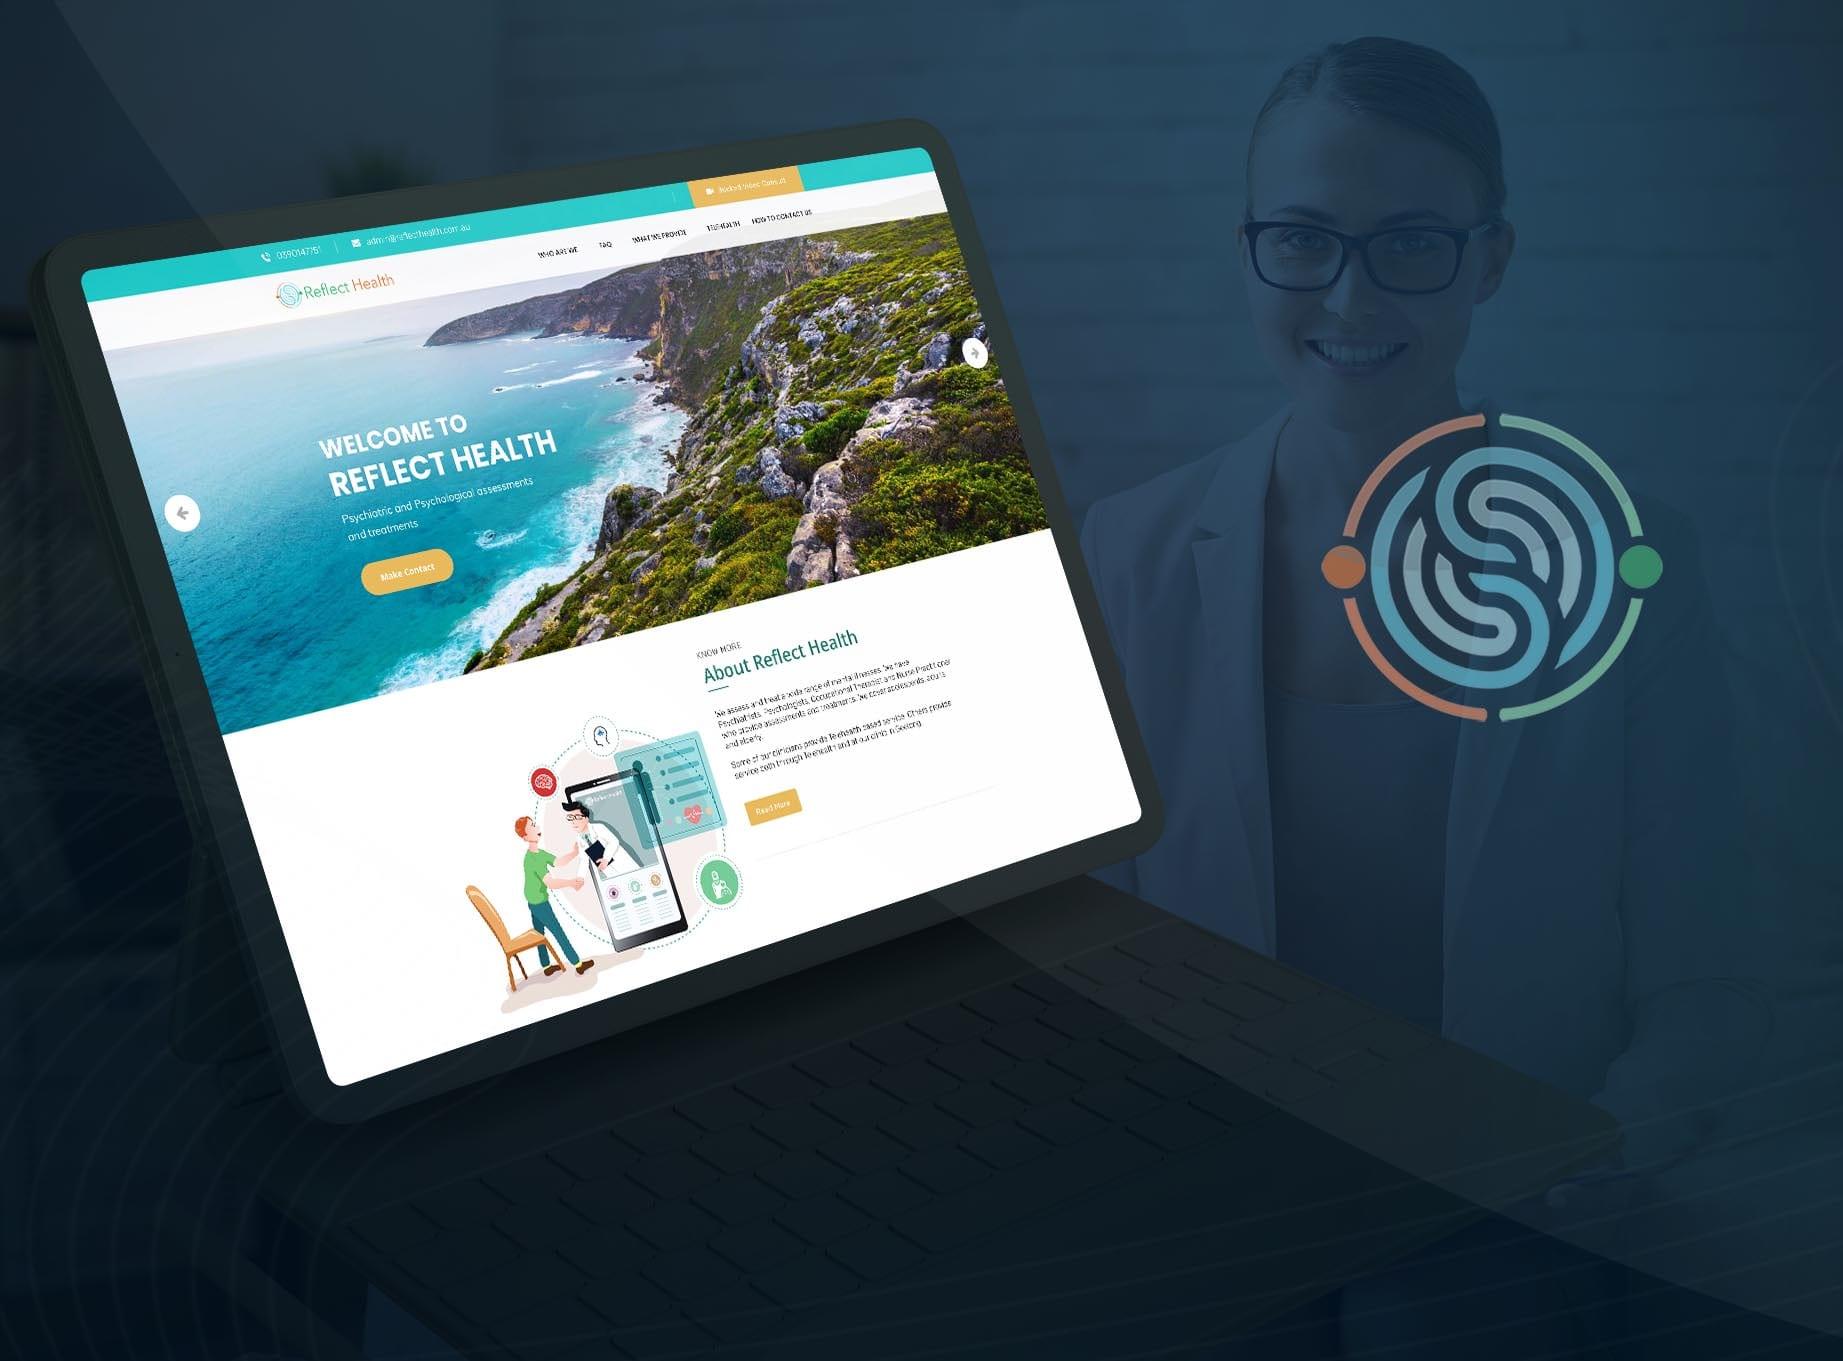 Reflect Health Australia - Web Design and Development by The Inventiv Hub